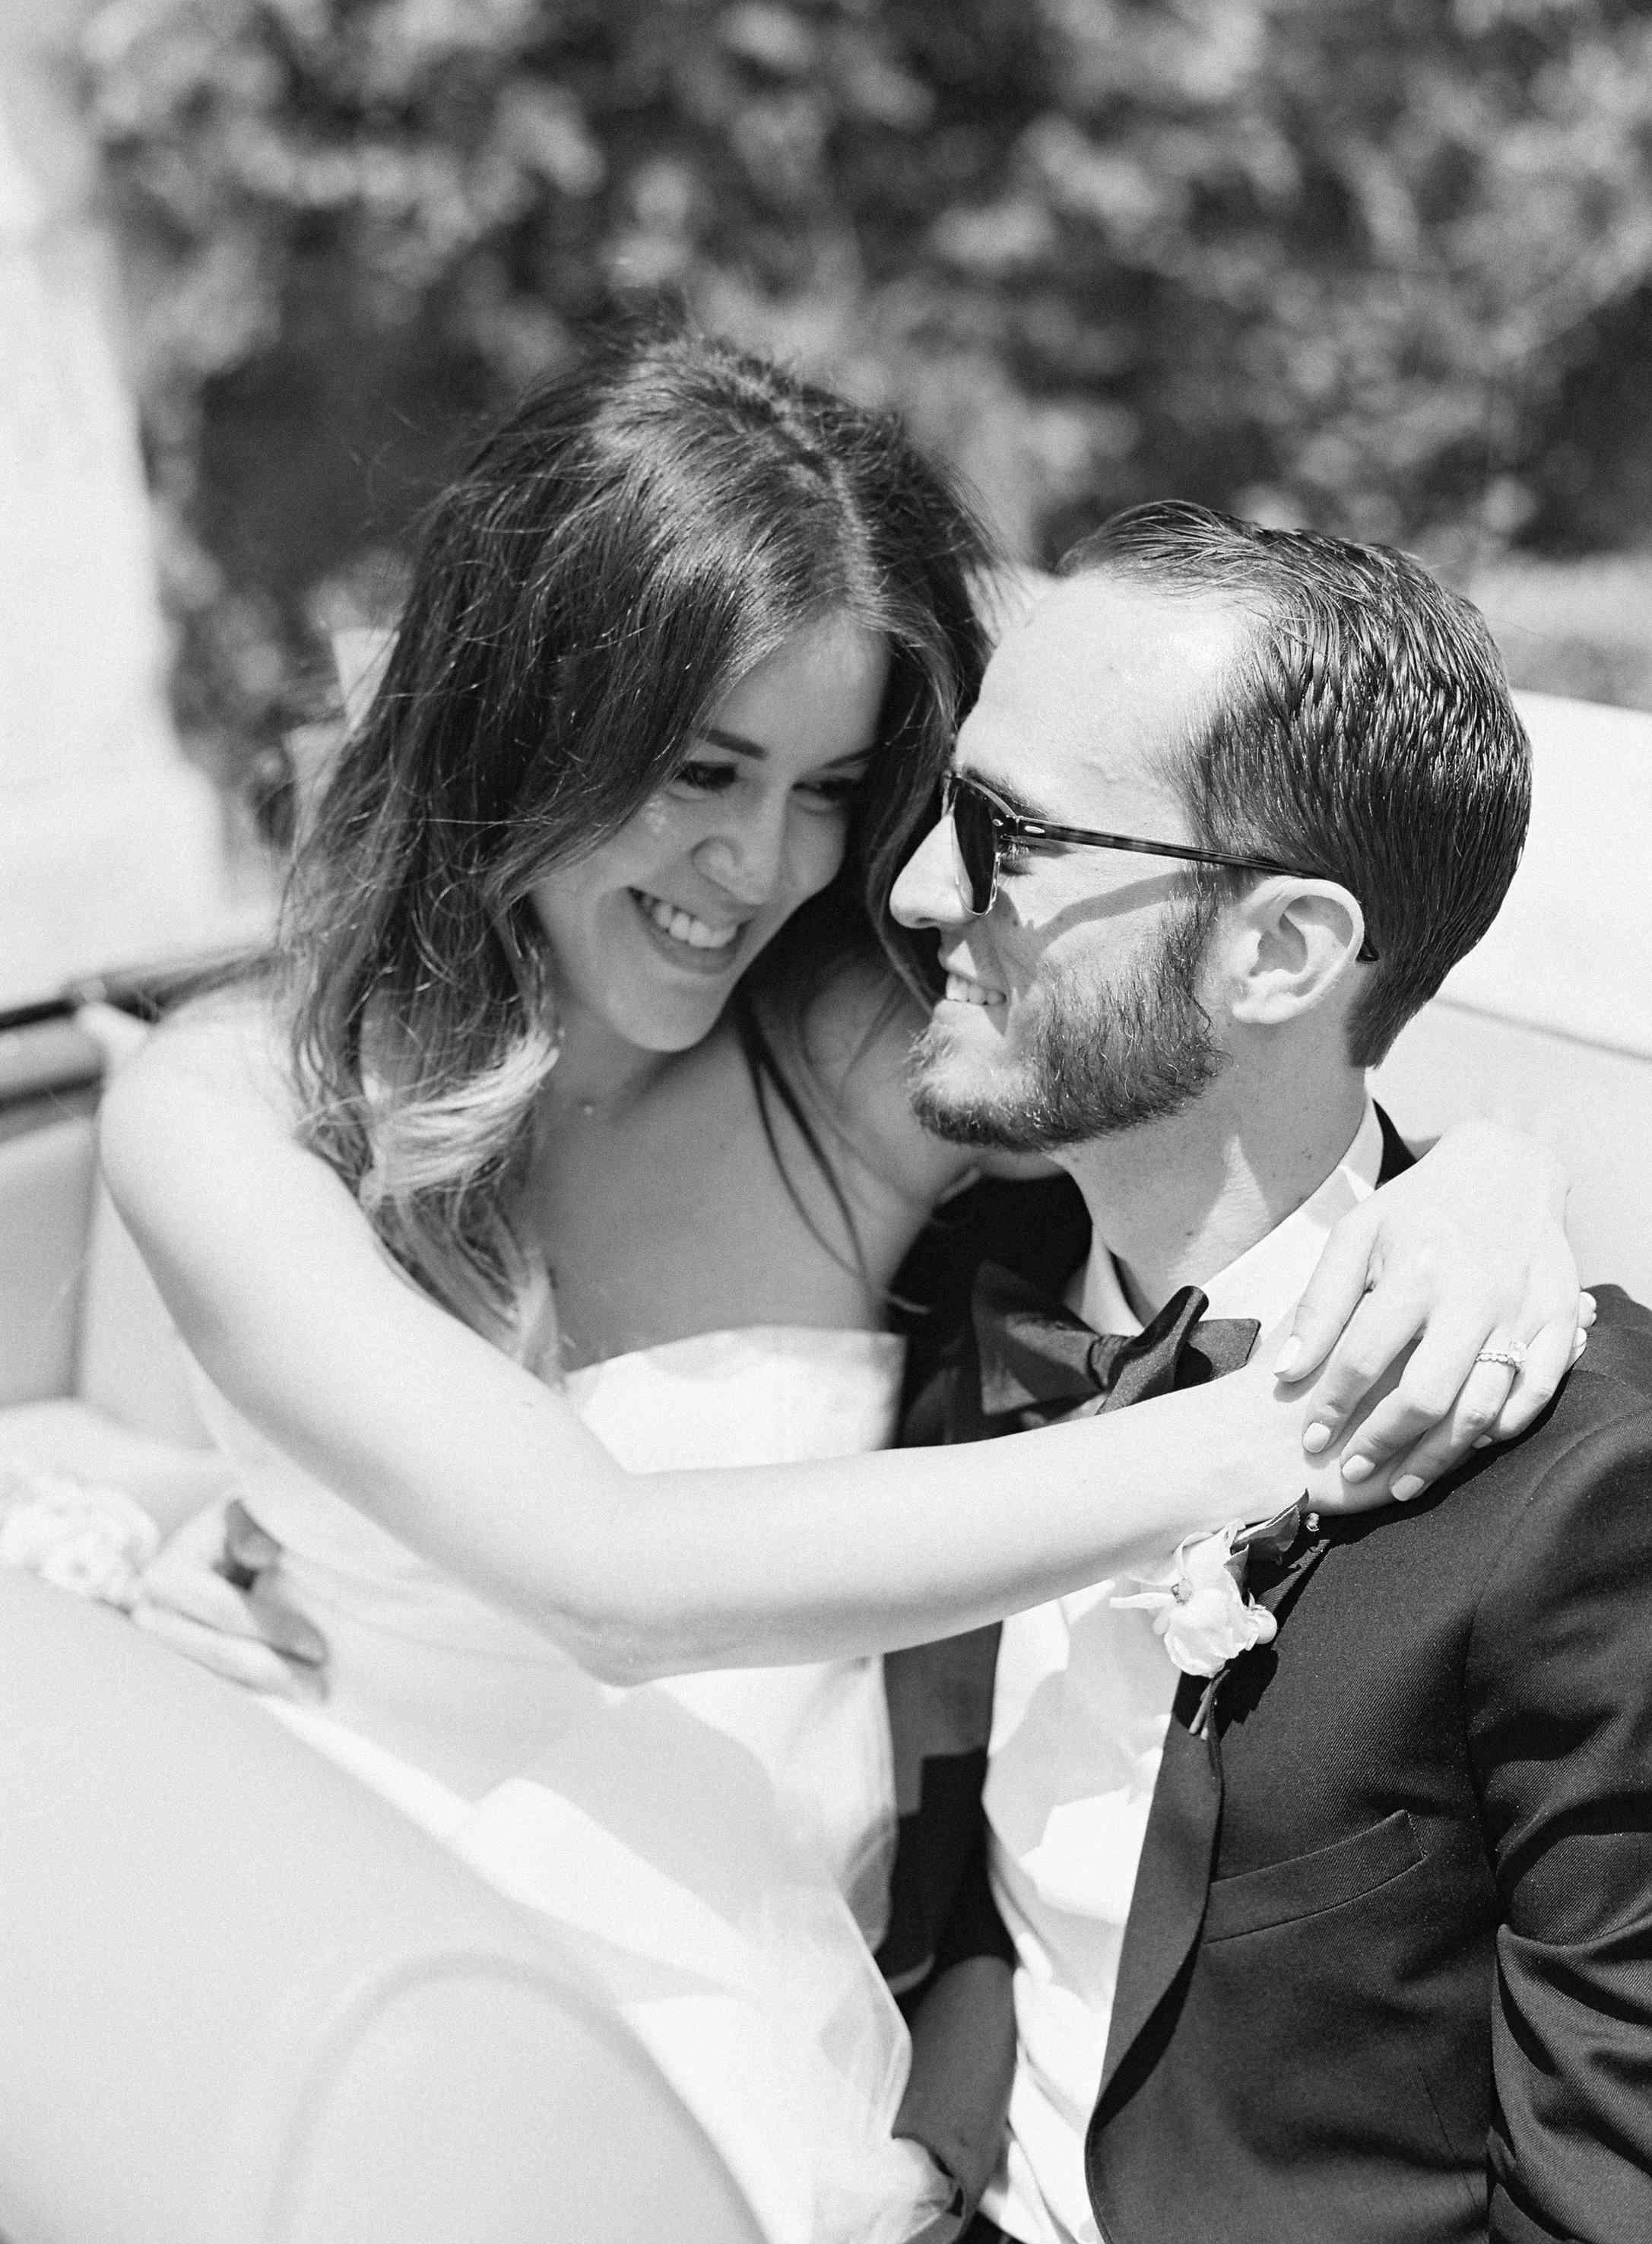 Portrait of couple on wedding day